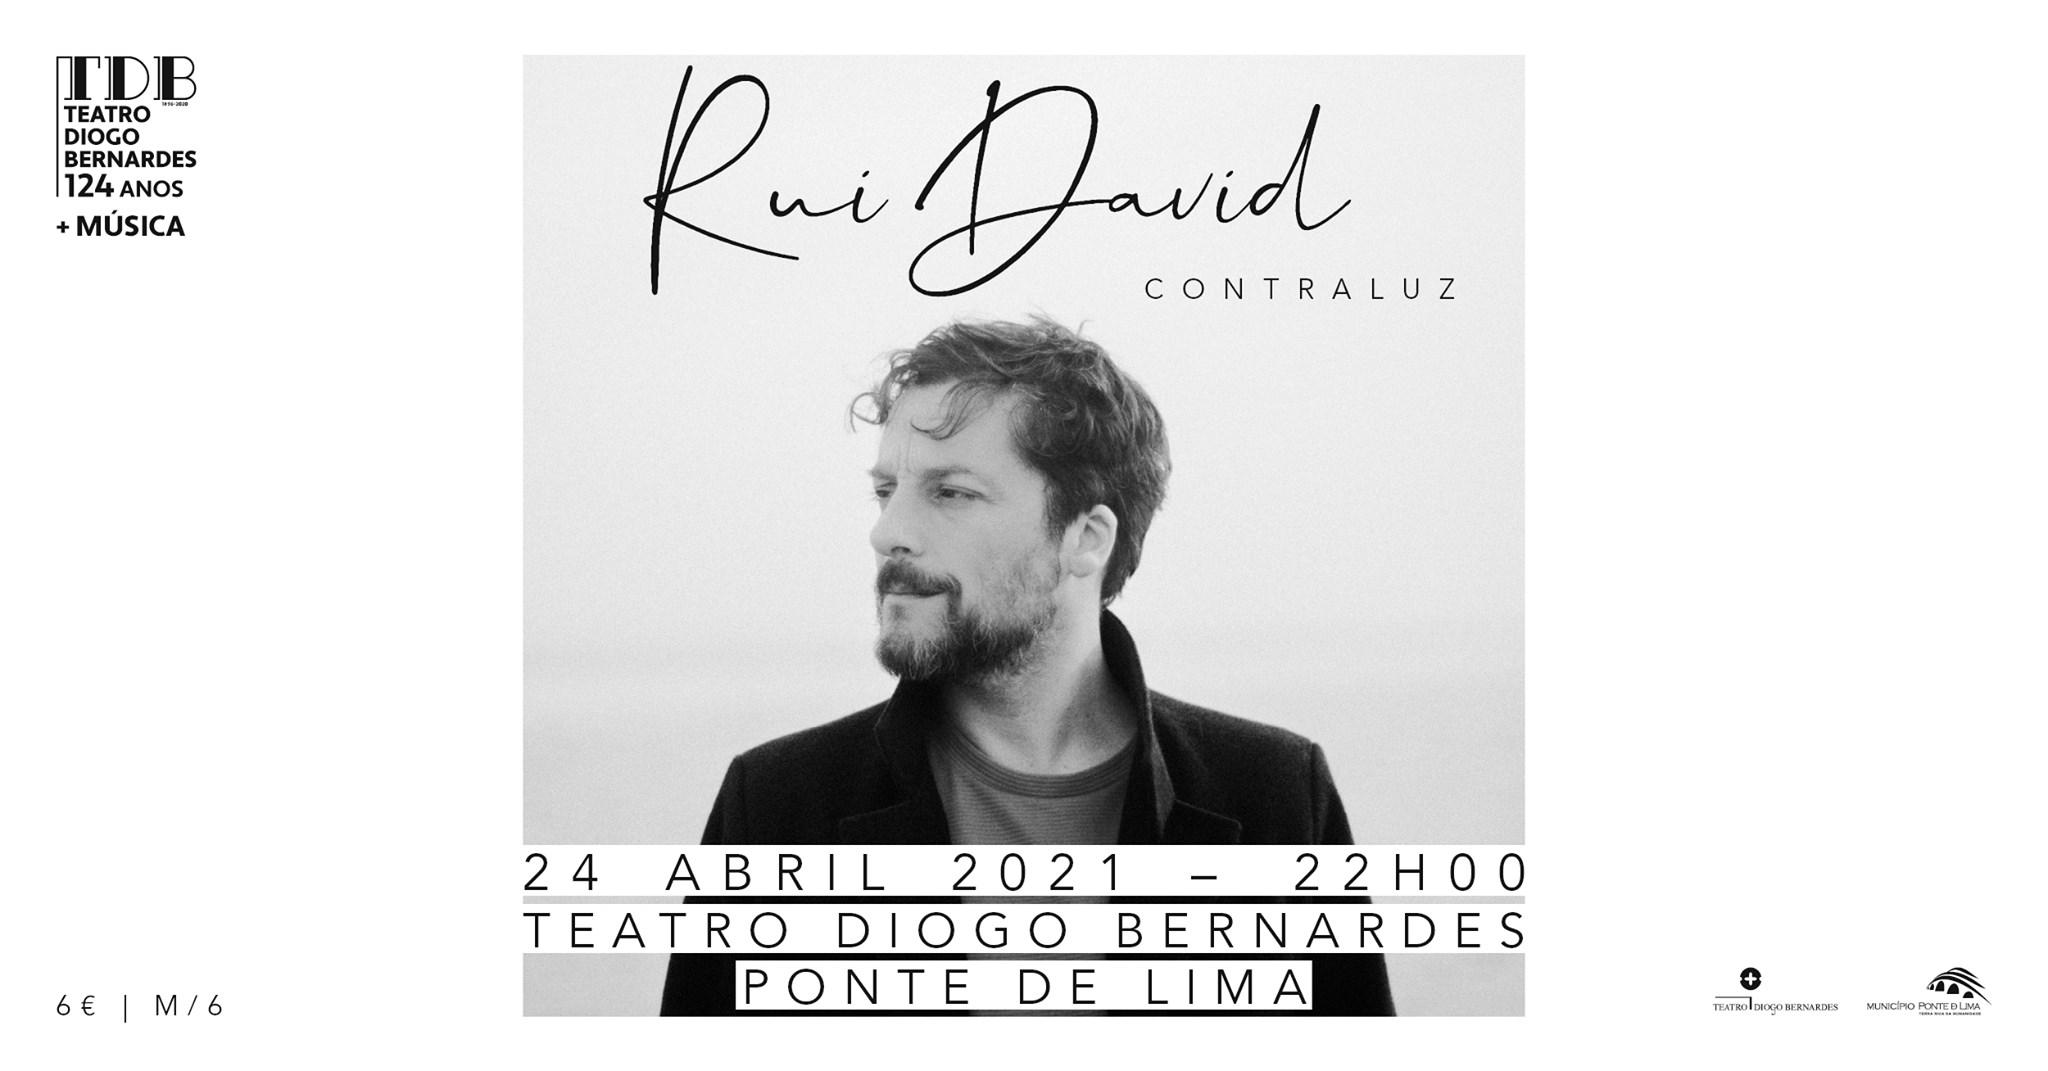 Rui David | Contraluz - Teatro Diogo Bernardes - Nova Data